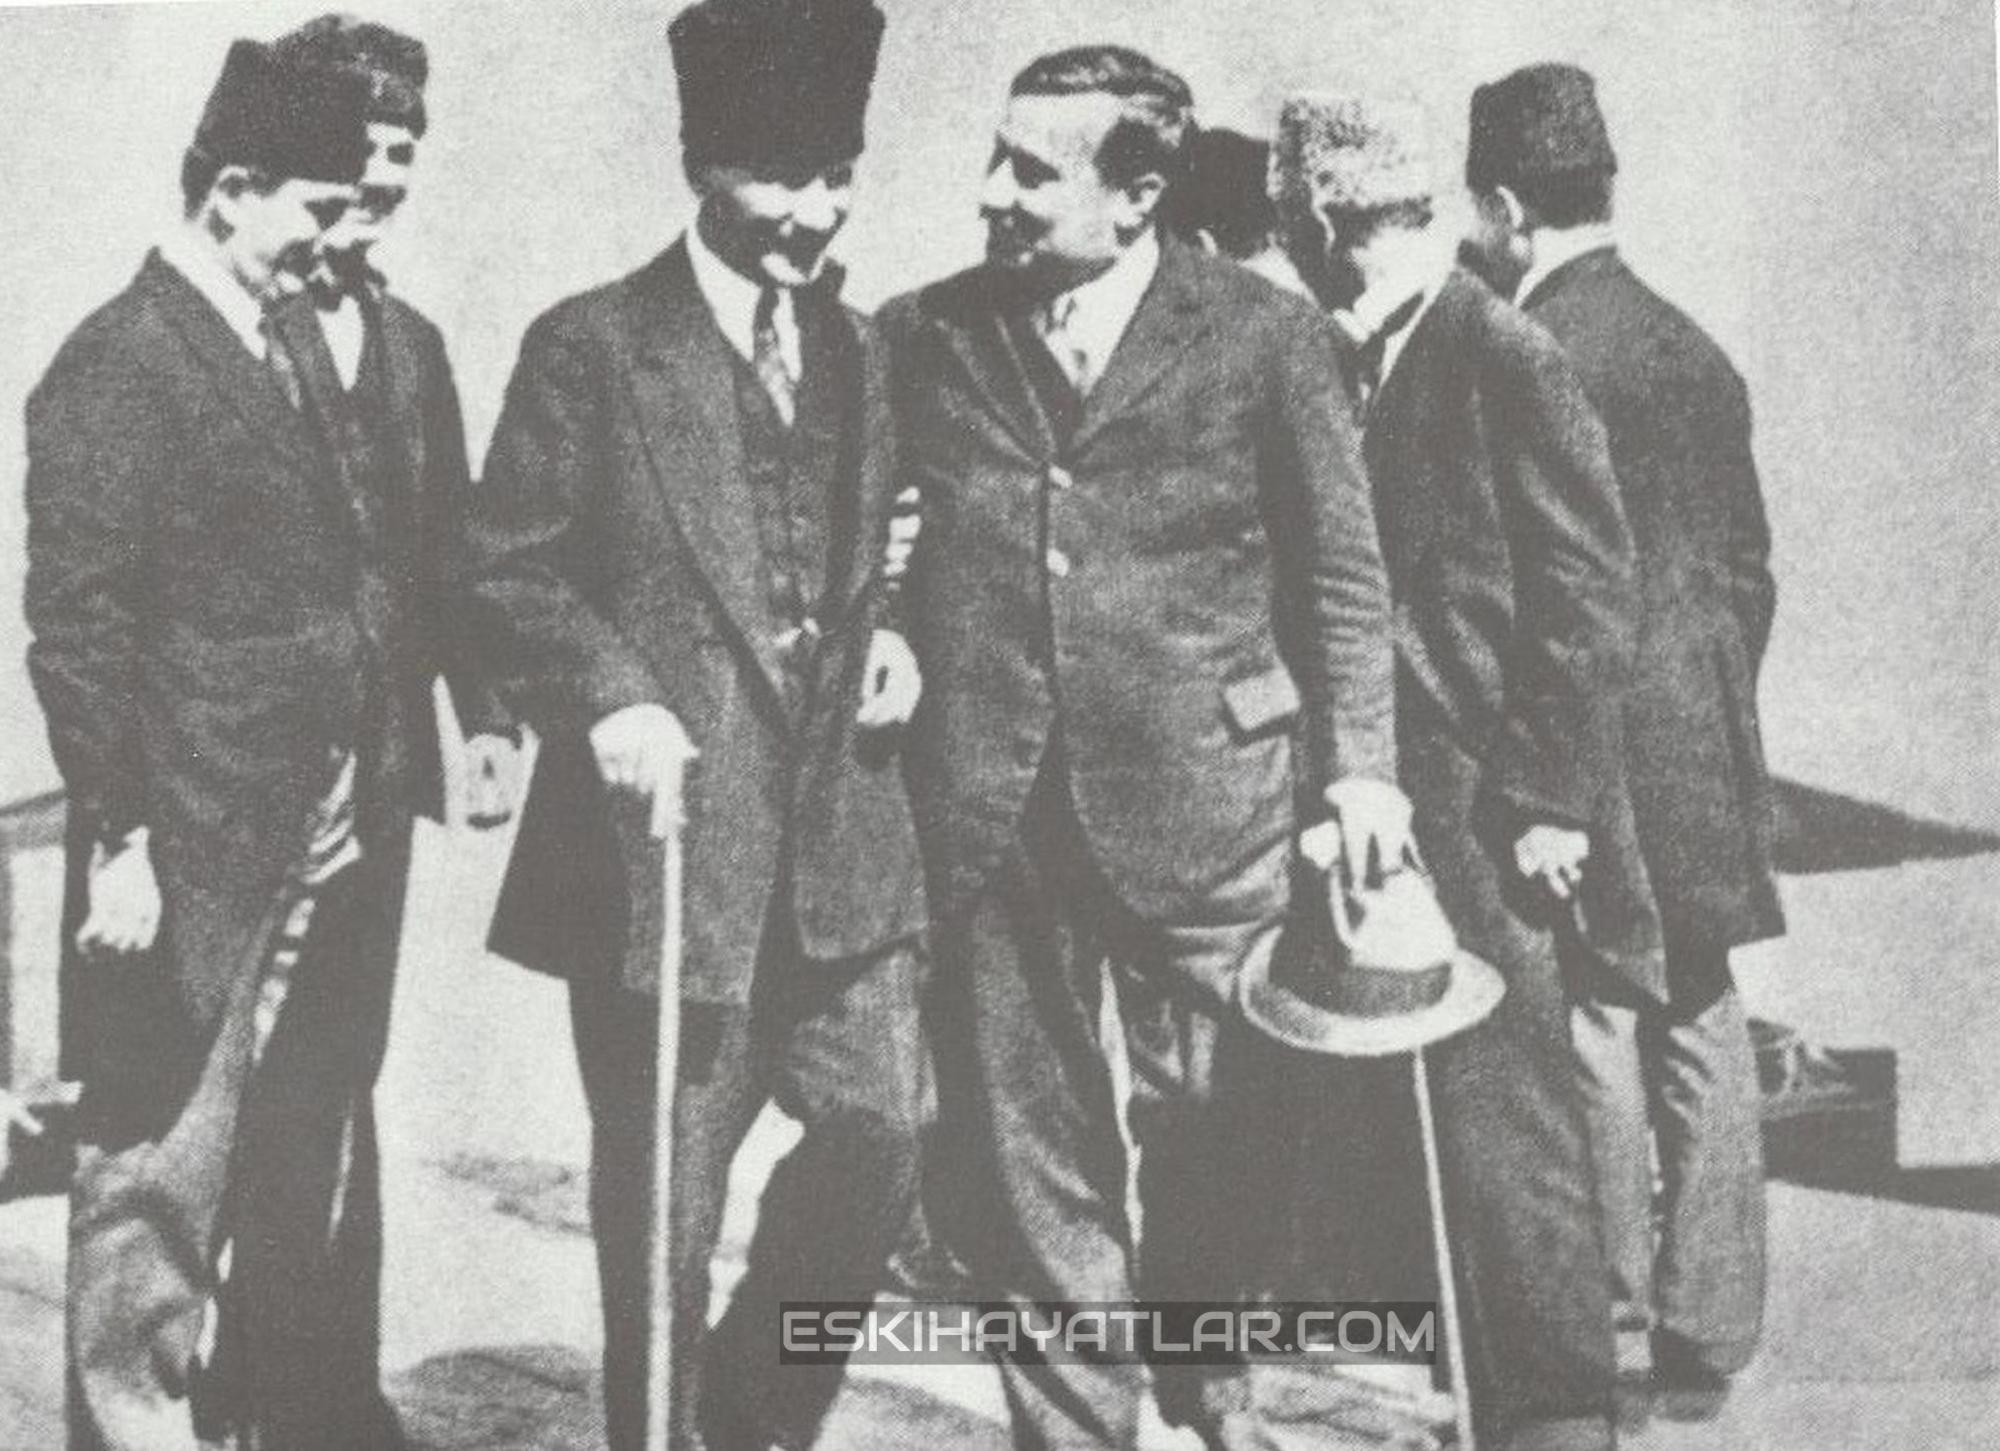 ataturk-izmir-gunleri-mustafa-kemal-pasa-1922-izmir-fotograflari (3)